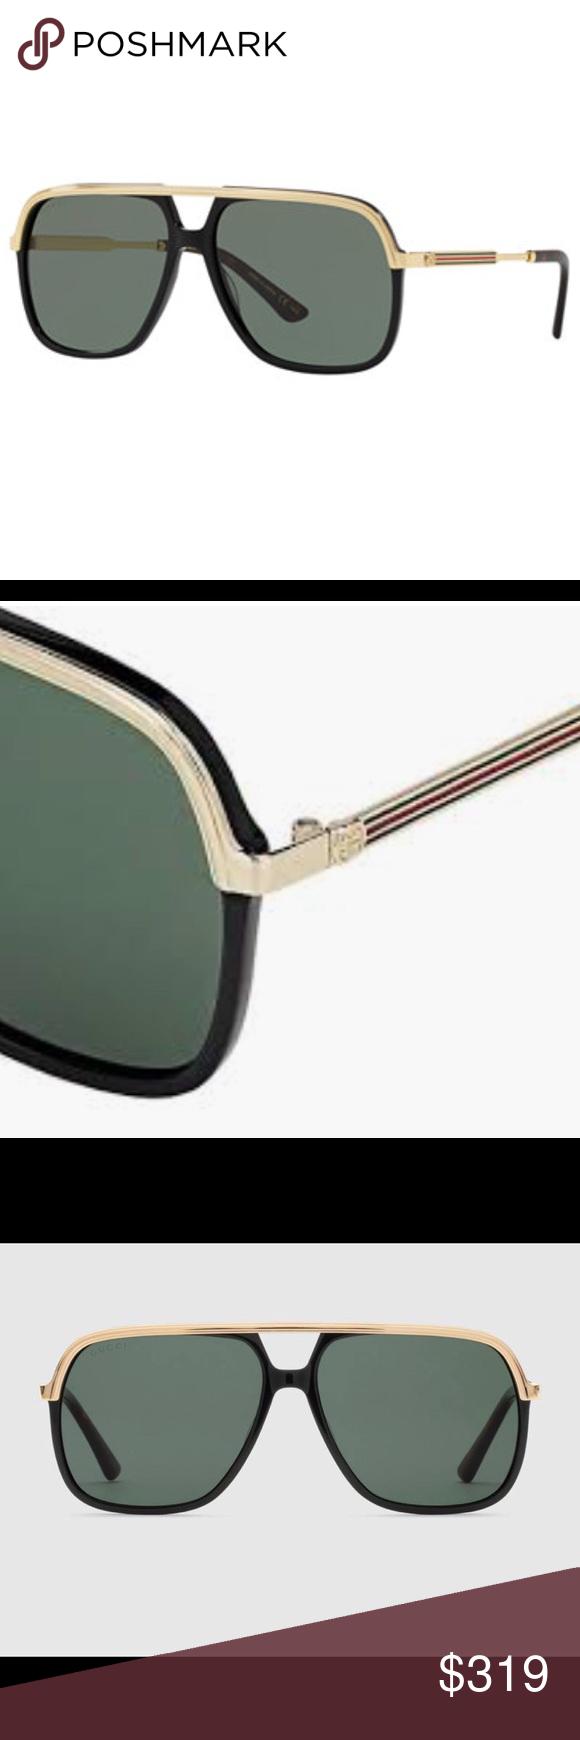 4207e6450fe25 Gucci GG 0200S BRAND 🆓‼ 🕶🦋 Case and Cleaning Cloth Included ‼ Gucci  Accessories Sunglasses